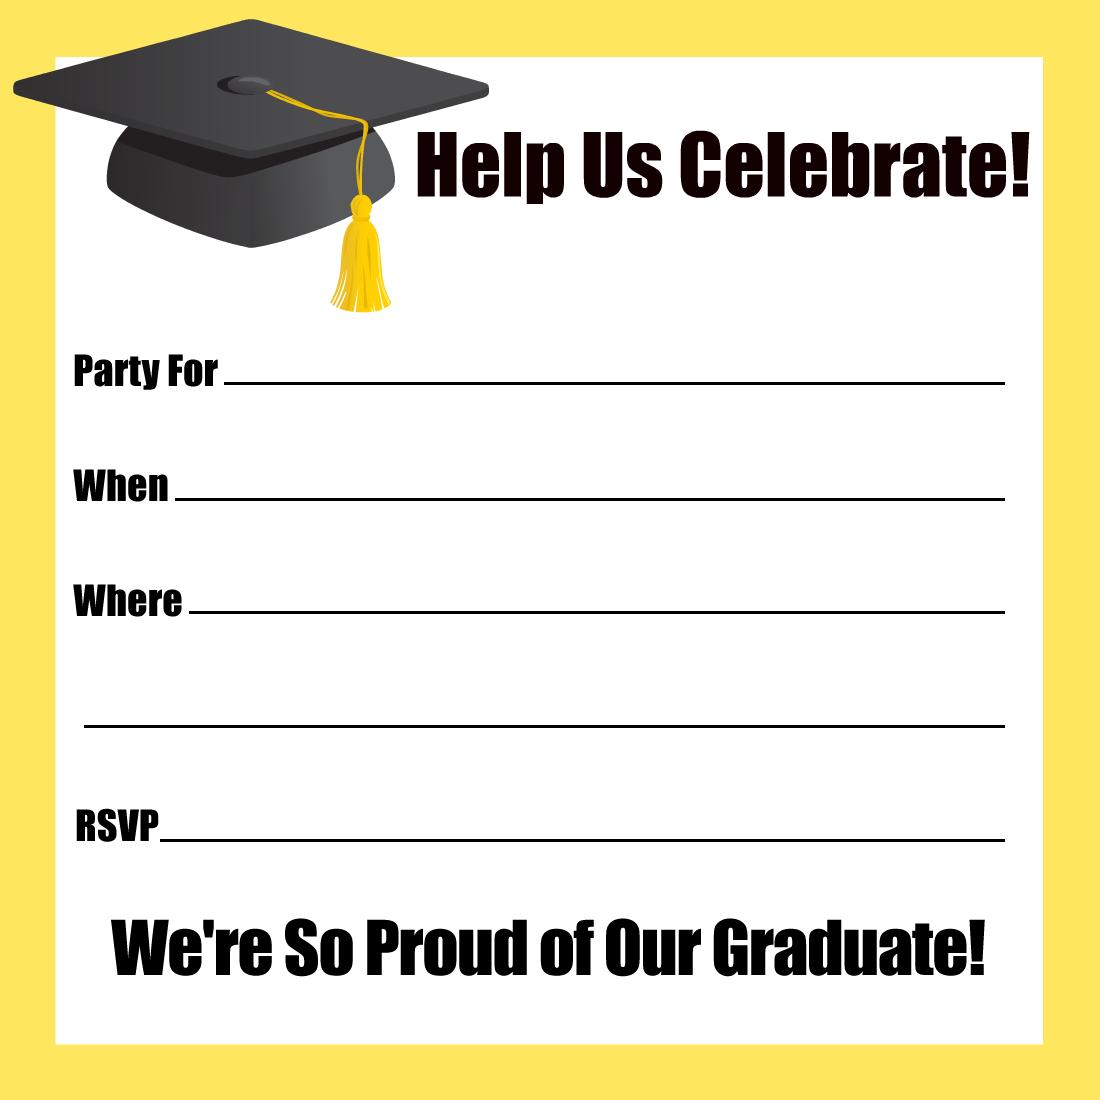 Free printable graduation party invitations party invitations free printable graduation party invitations filmwisefo Images